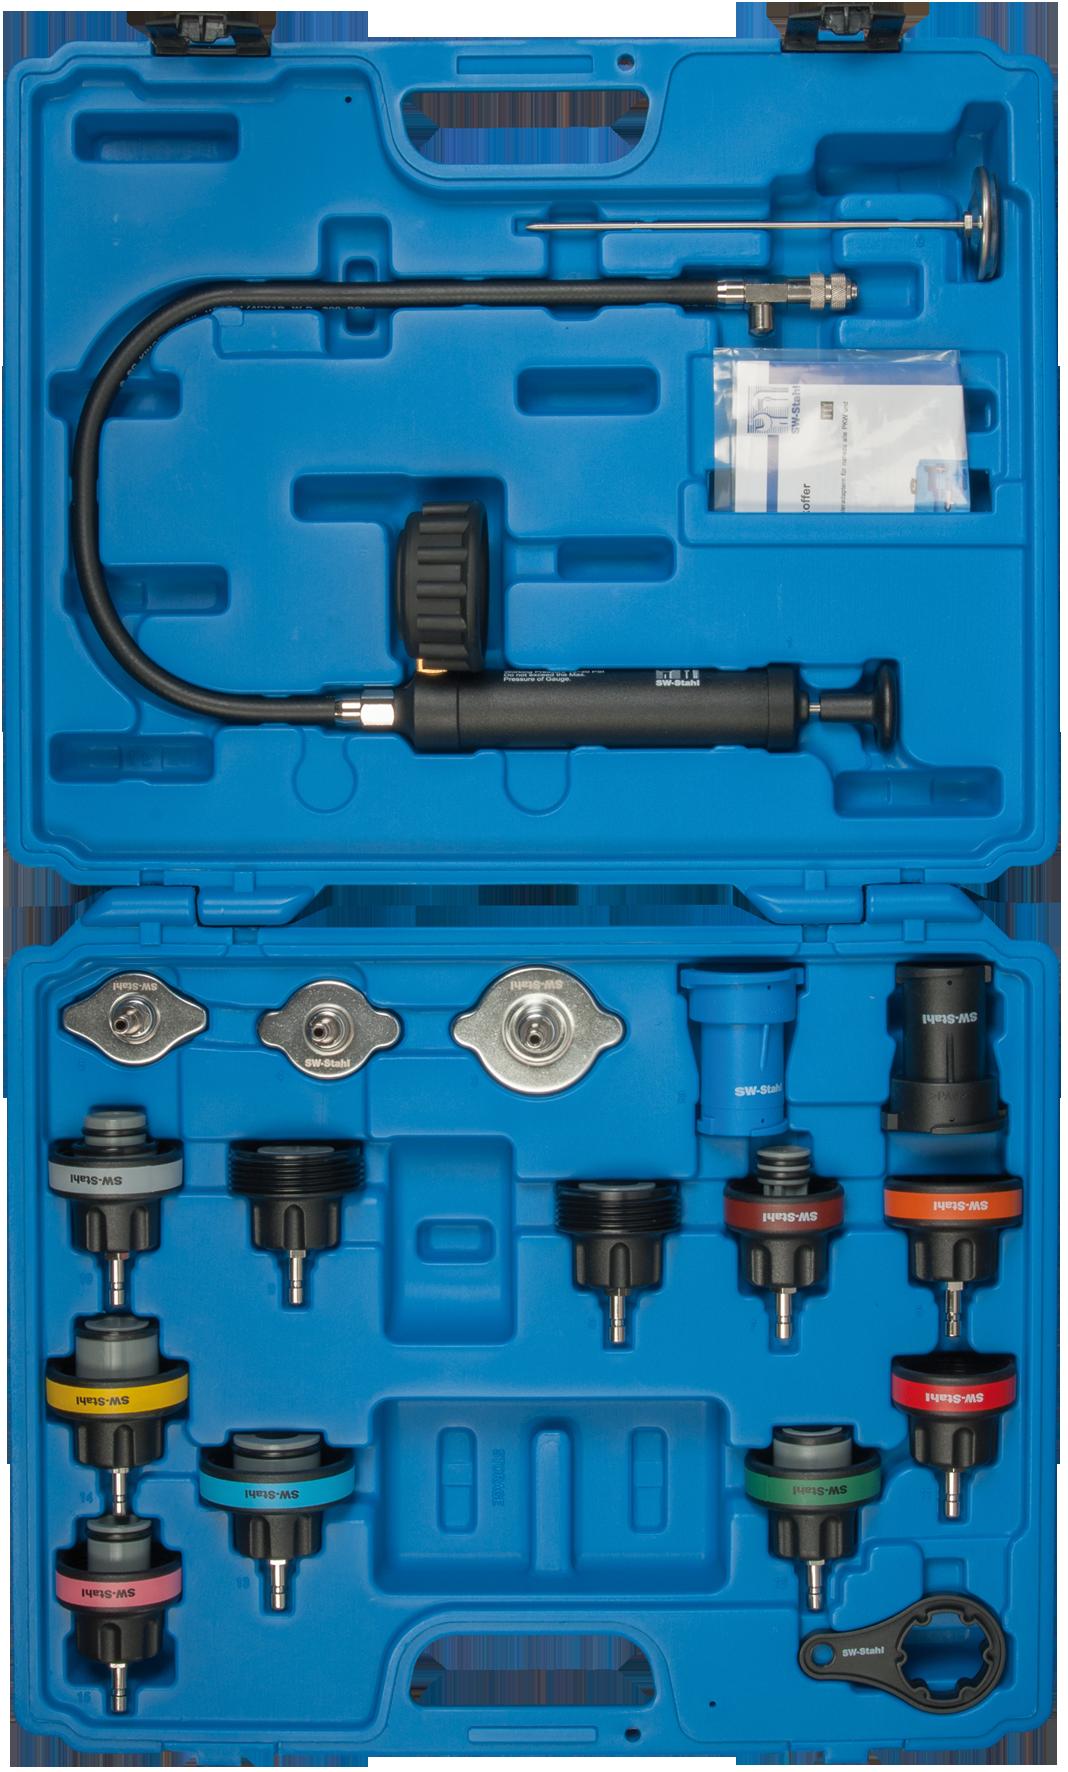 SWSTAHL Radiator removal tool case, 18-piece 21000L